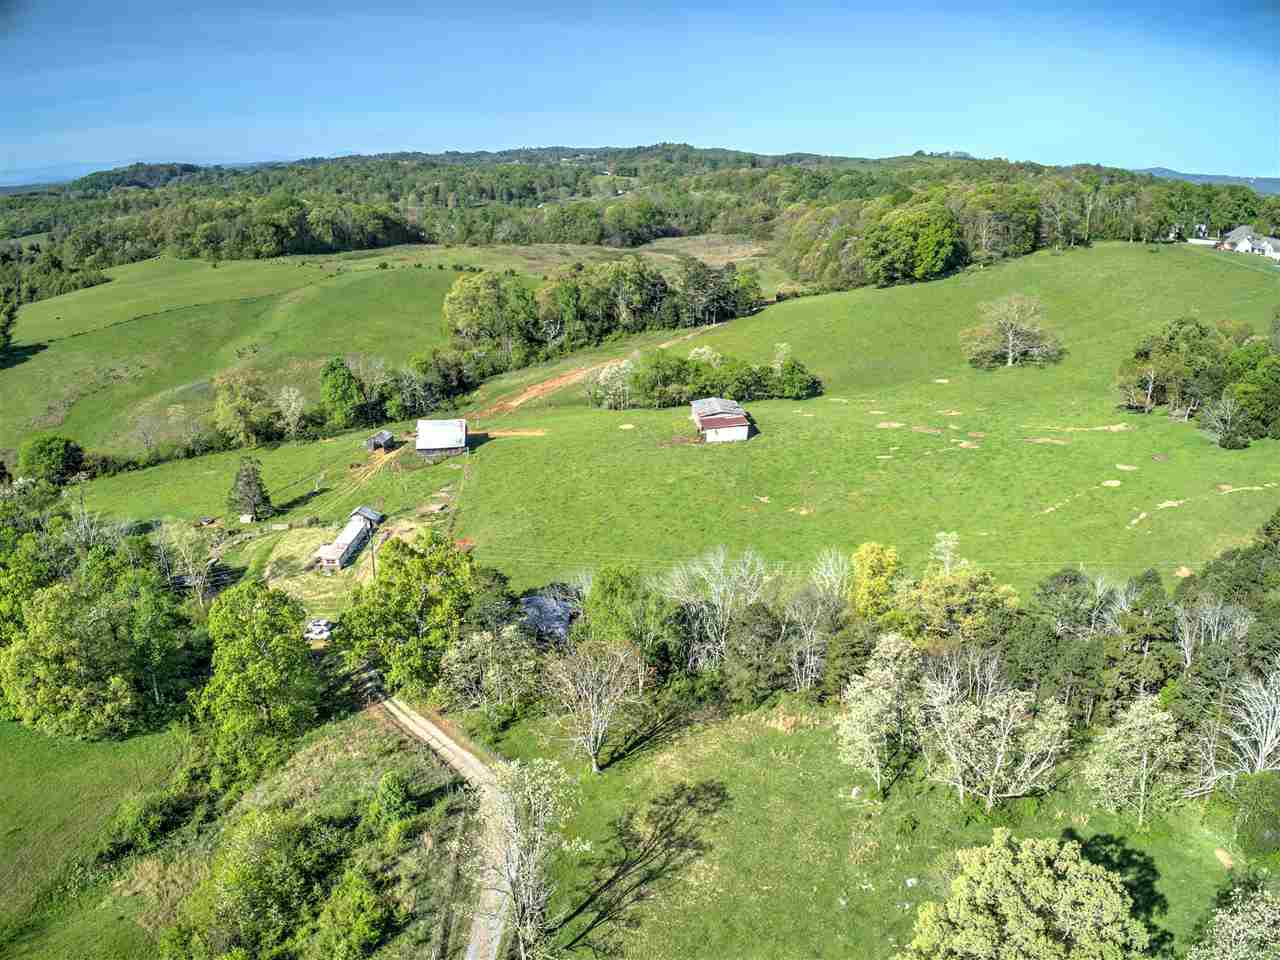 Real Estate for Sale, ListingId: 31133087, Morristown,TN37813